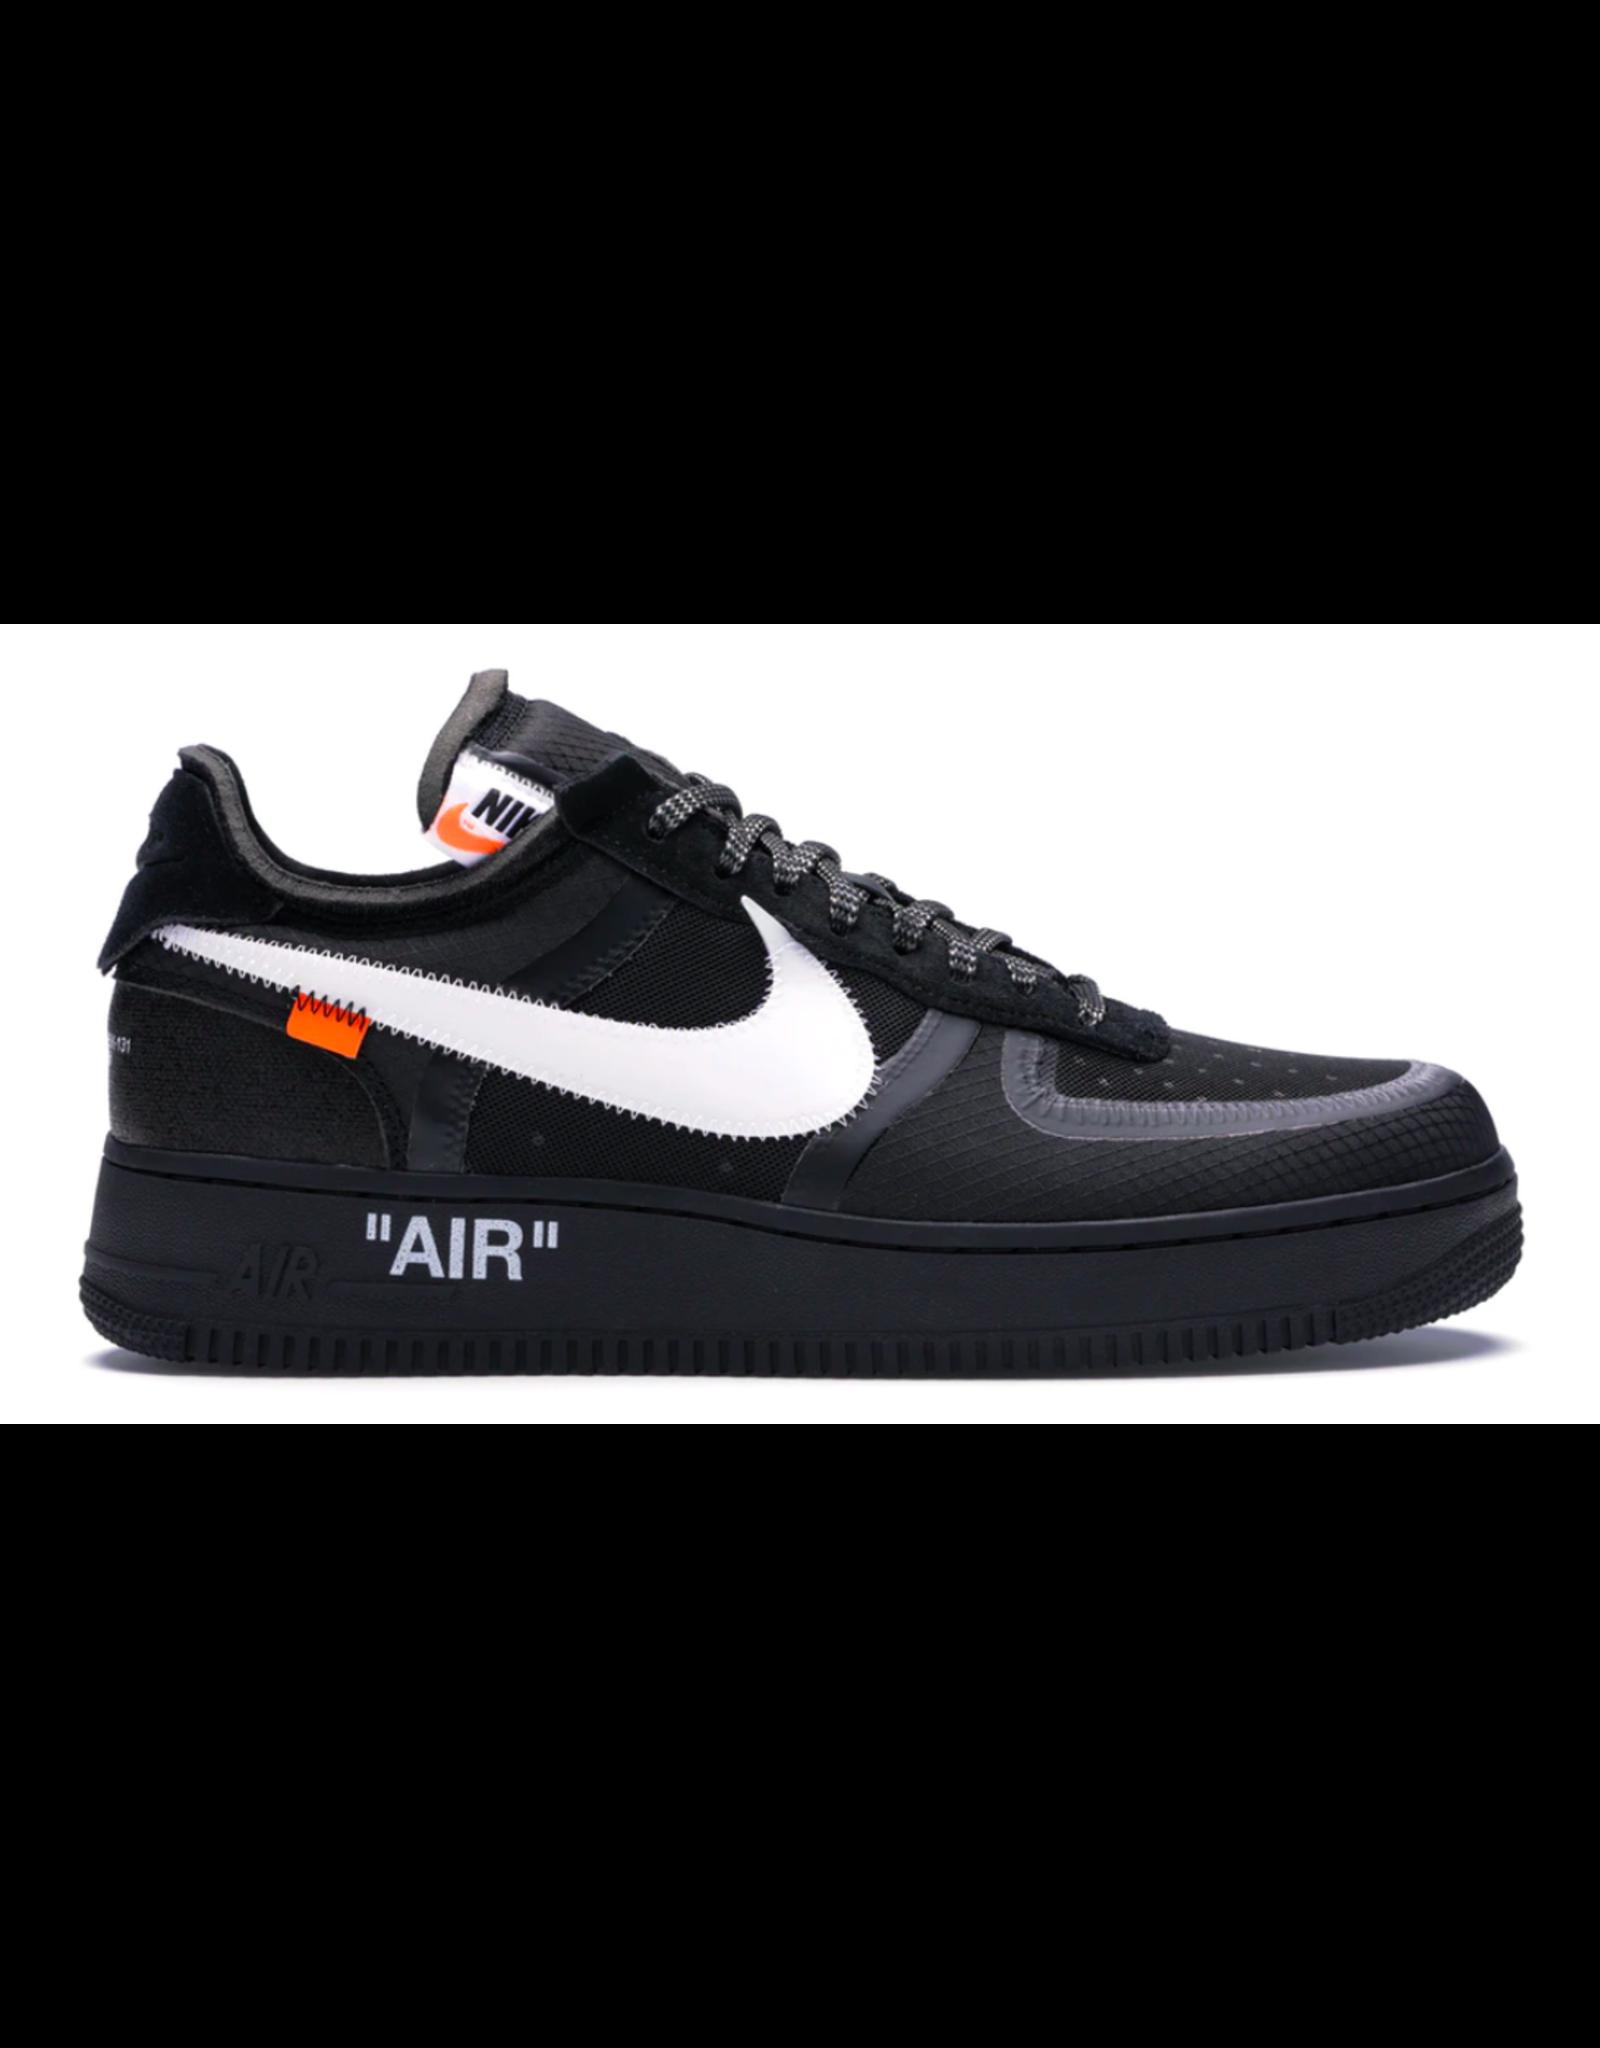 NIKE Nike Air Force 1 Low Off-White Black White